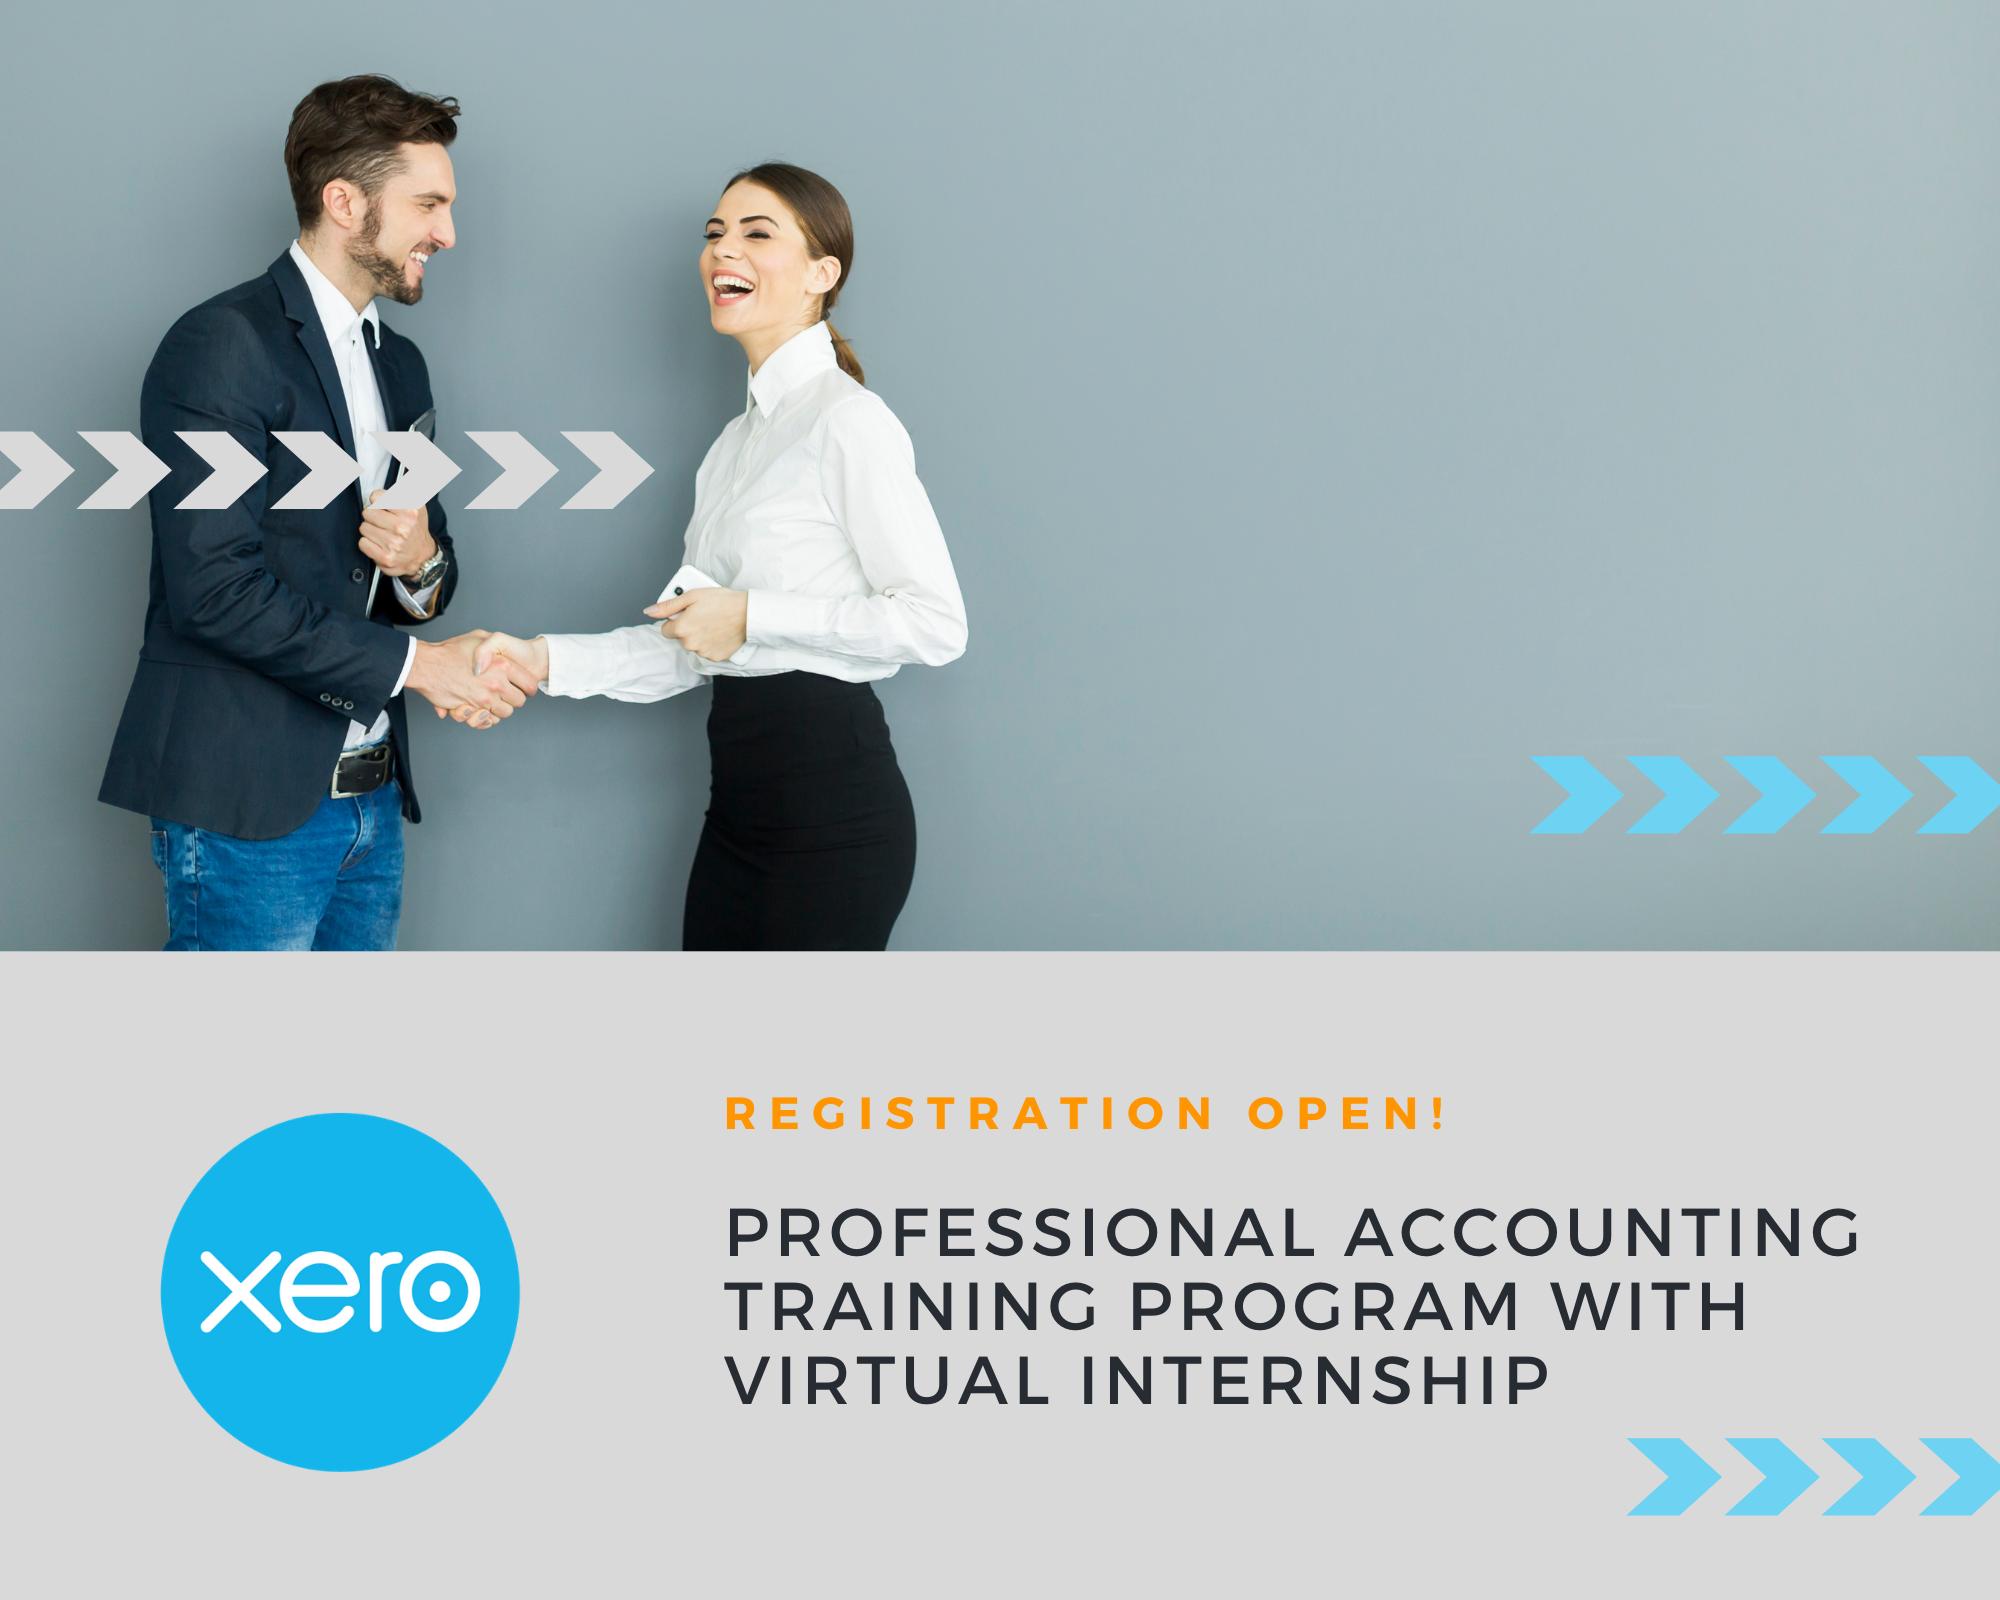 Professional Accounting Training